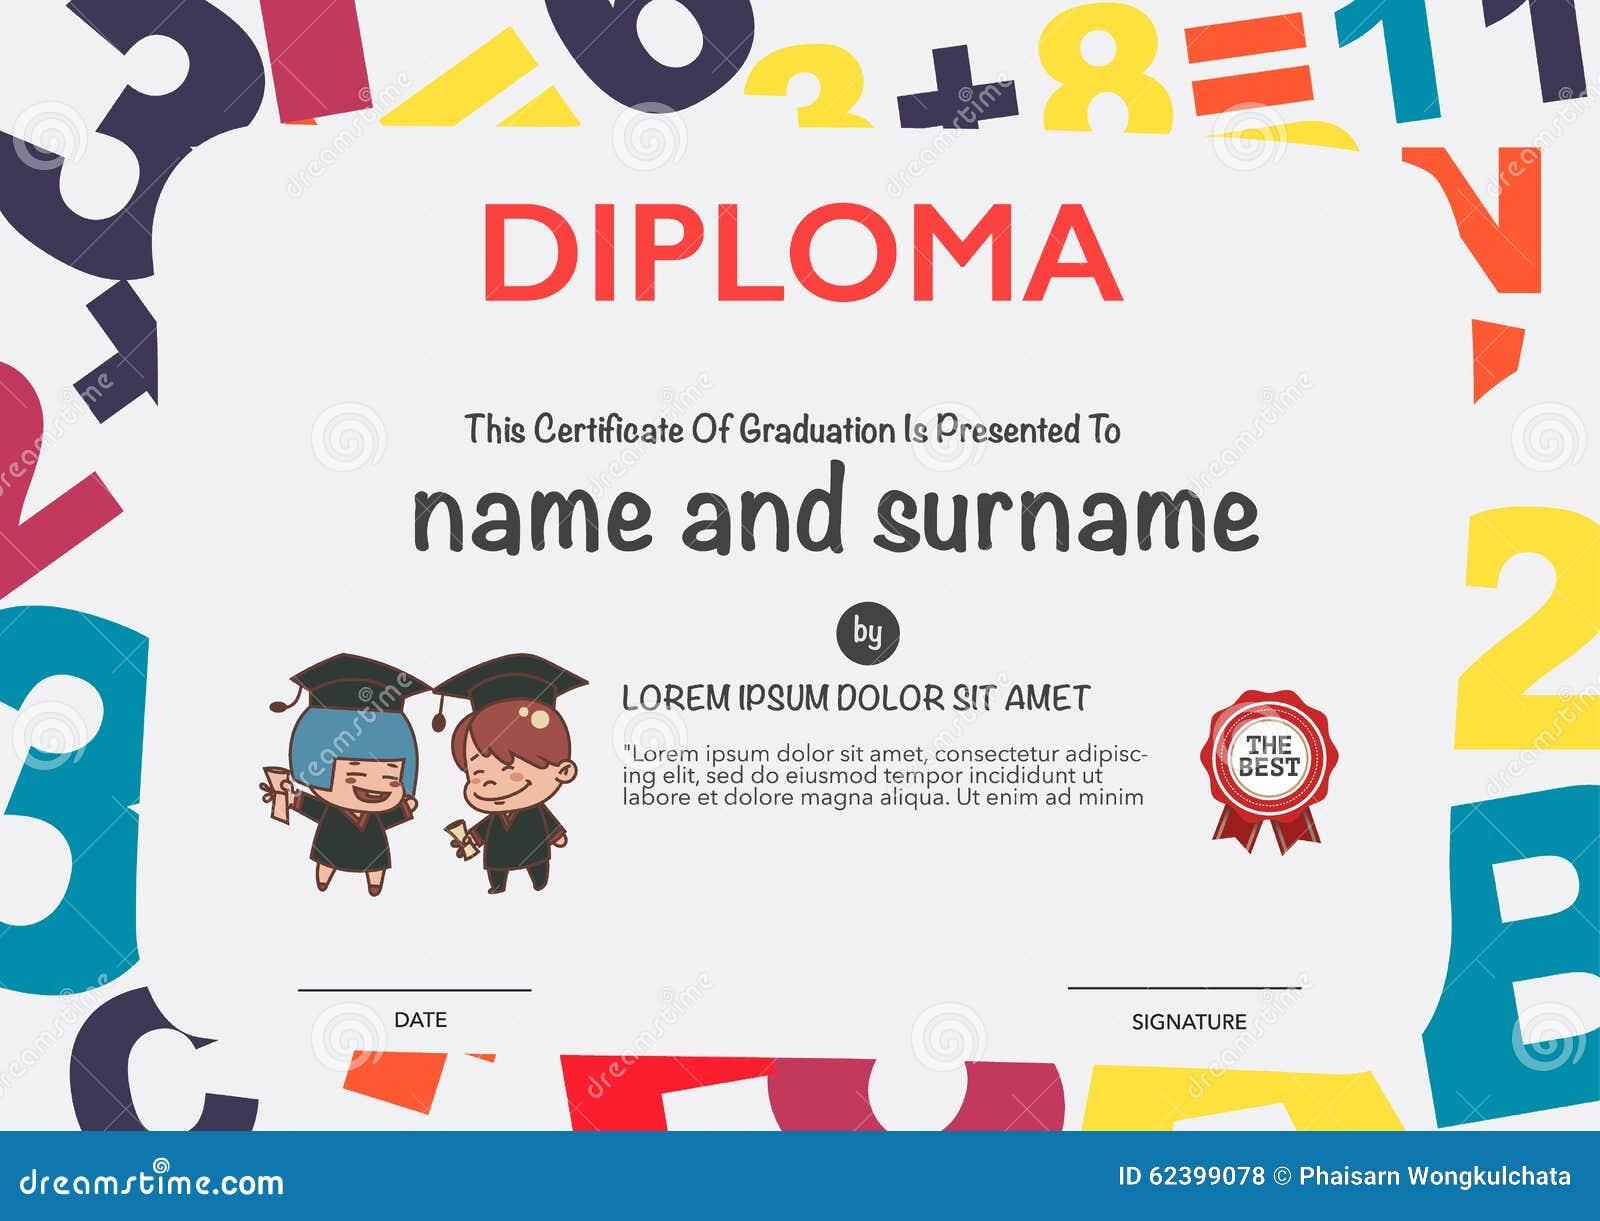 kindergarten certificates | just b.CAUSE